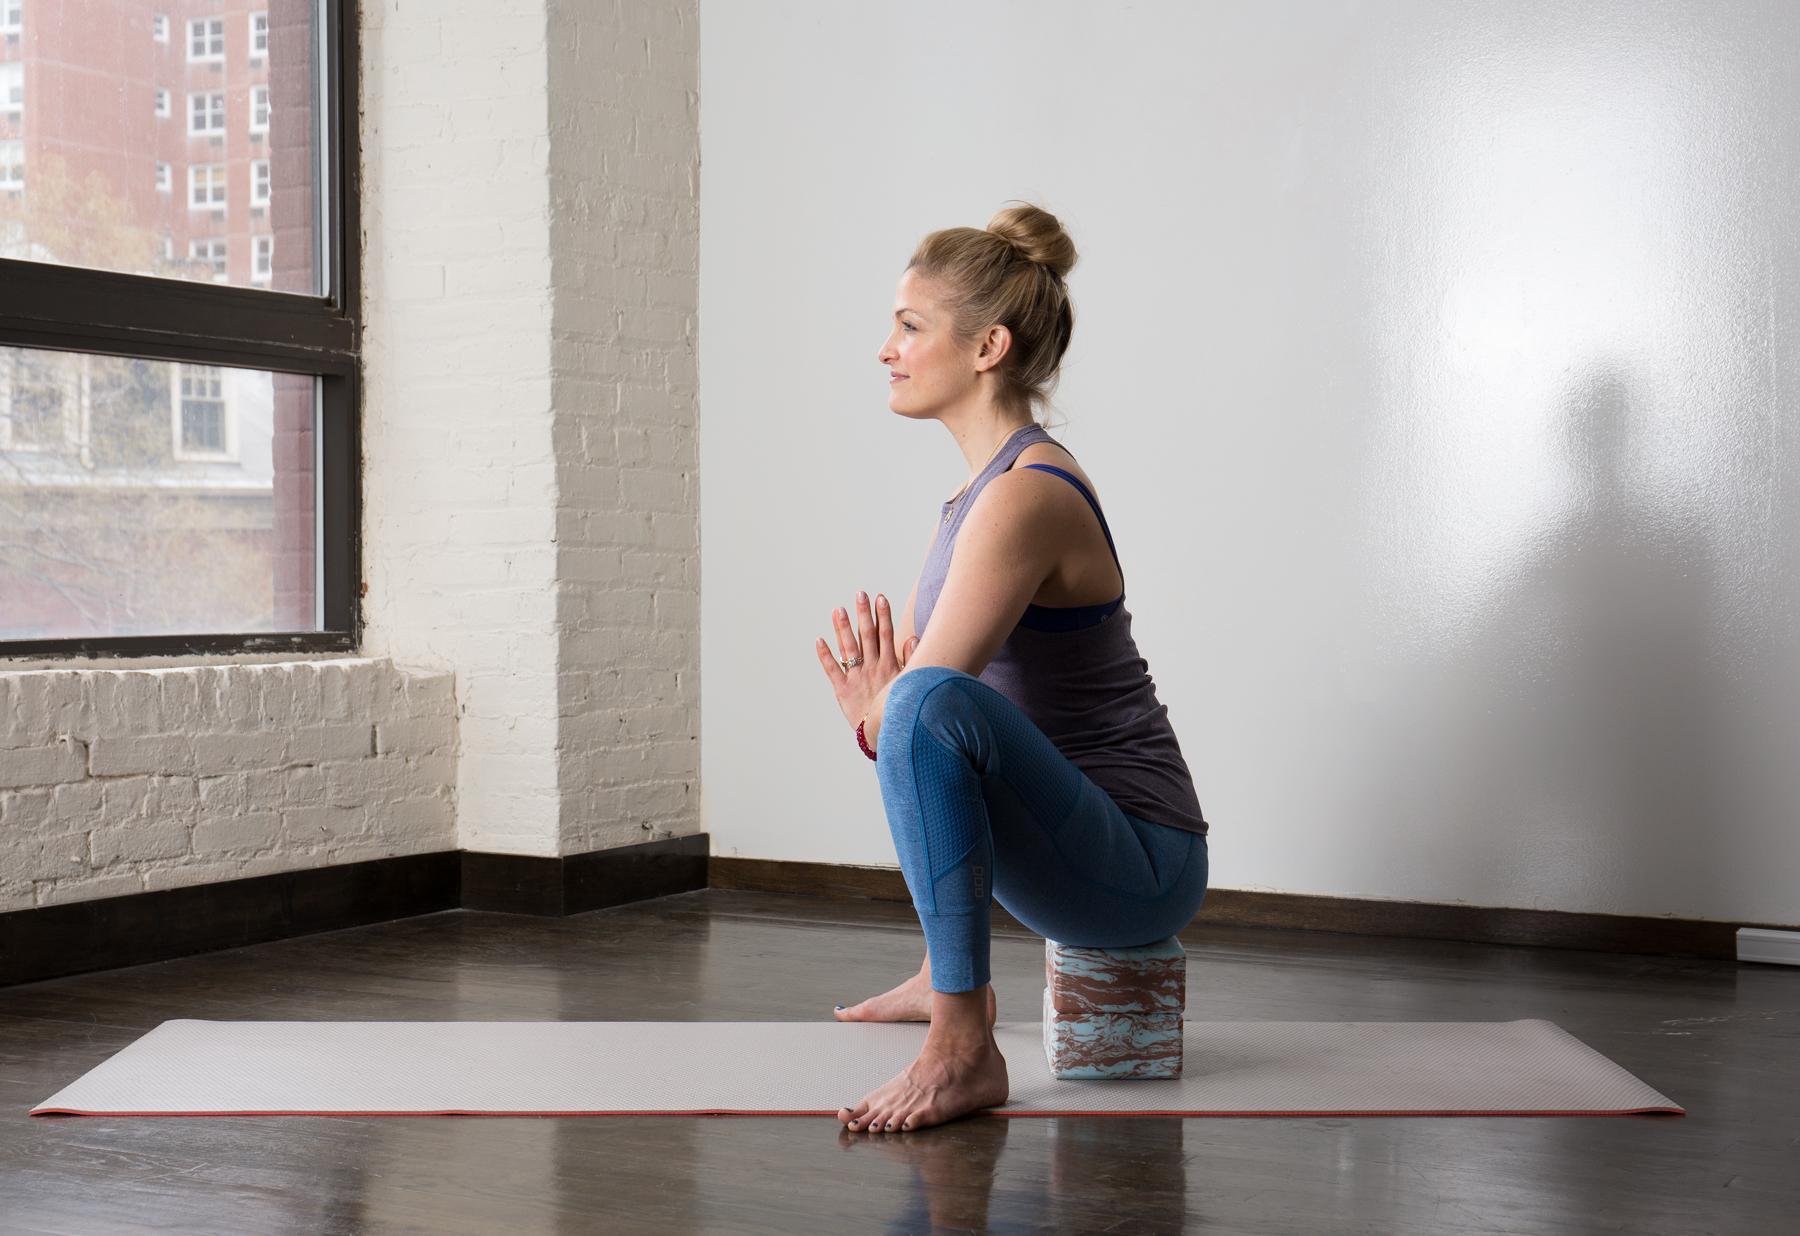 Prenatal Yoga: 12 Soothing Poses for Pregnant Women | Greatist